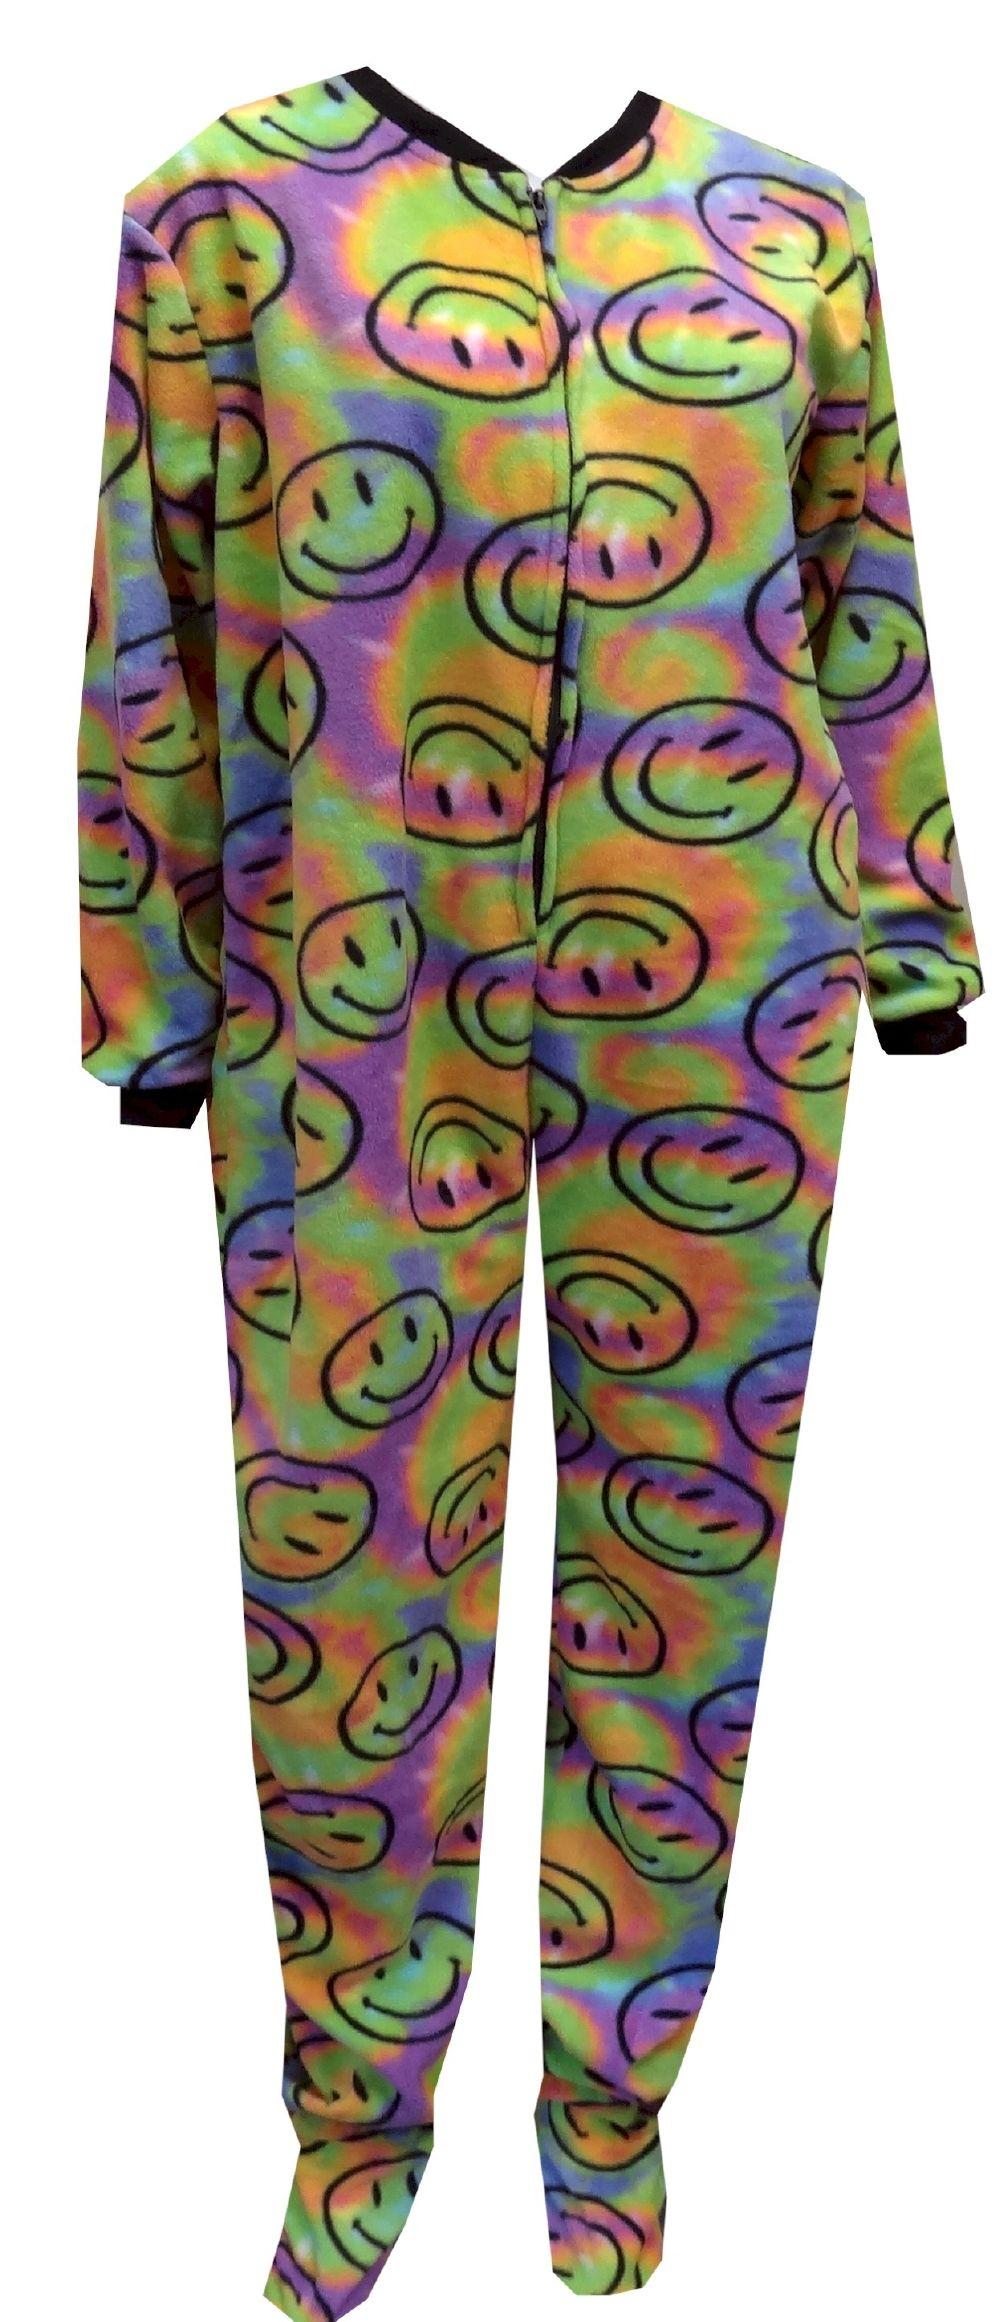 9c73077df Smiley Tie Dye Footie Onesie Pajama Warm and fun! These pajamas for ...